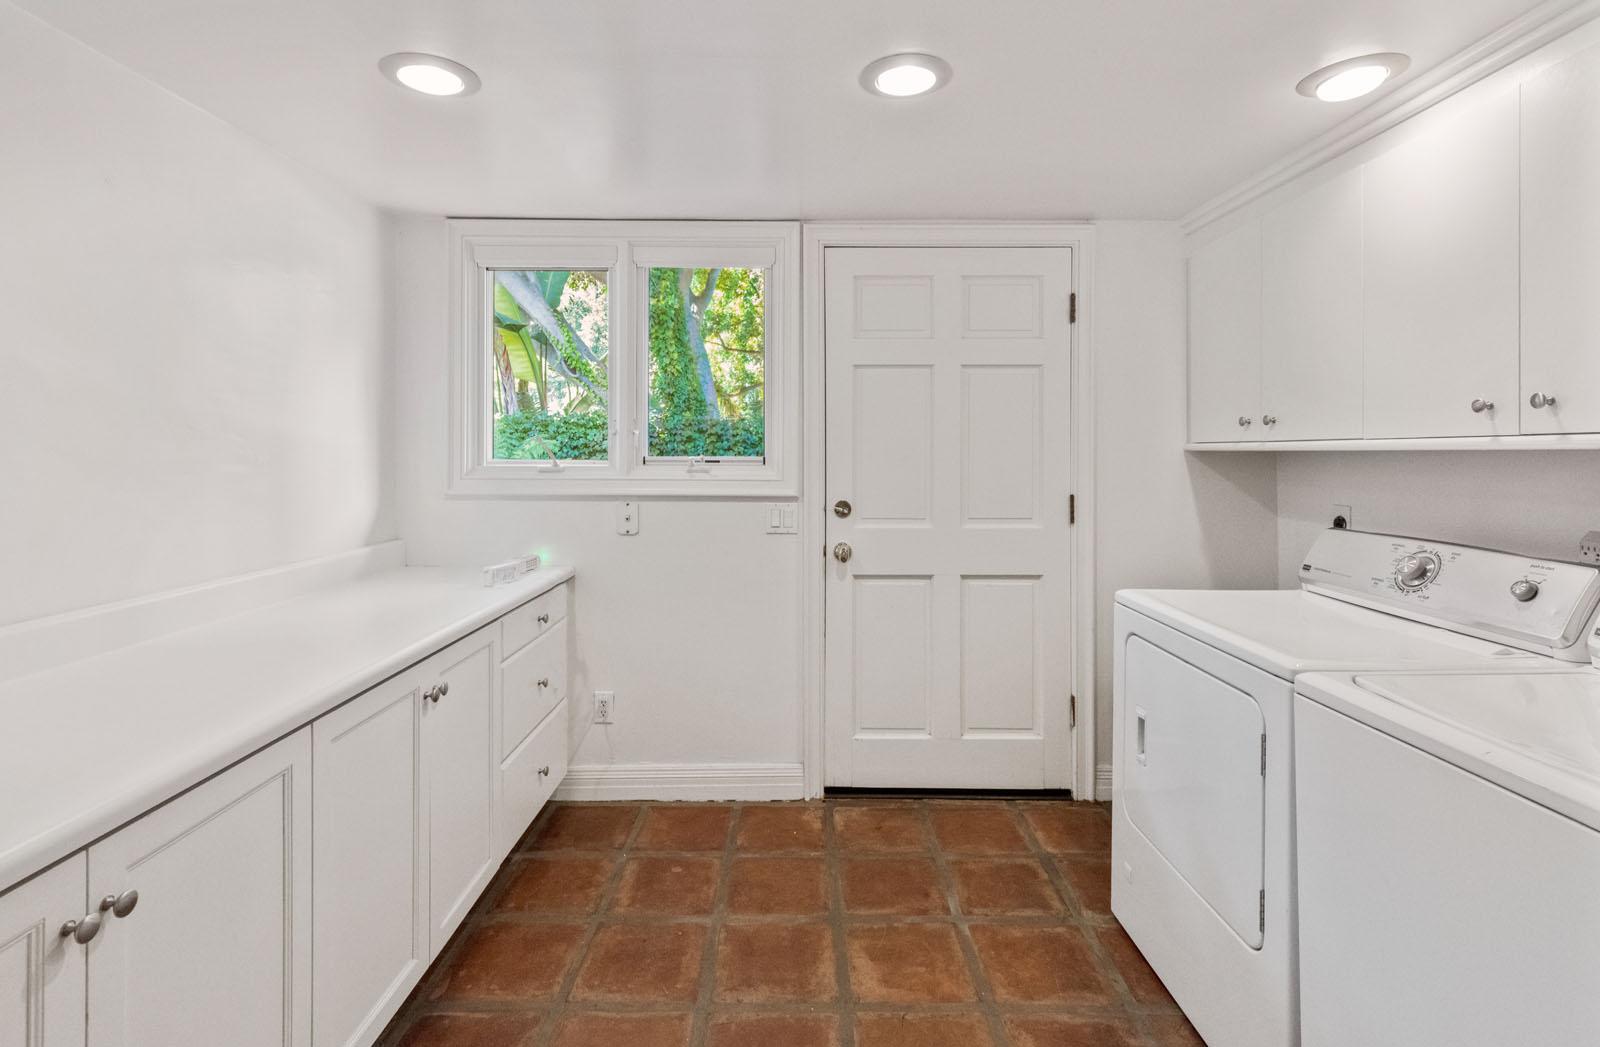 030 Laundry 1712 Manzanita Park Avenue Malibu For Sale Lease The Malibu Life Team Luxury Real Estate.jpg